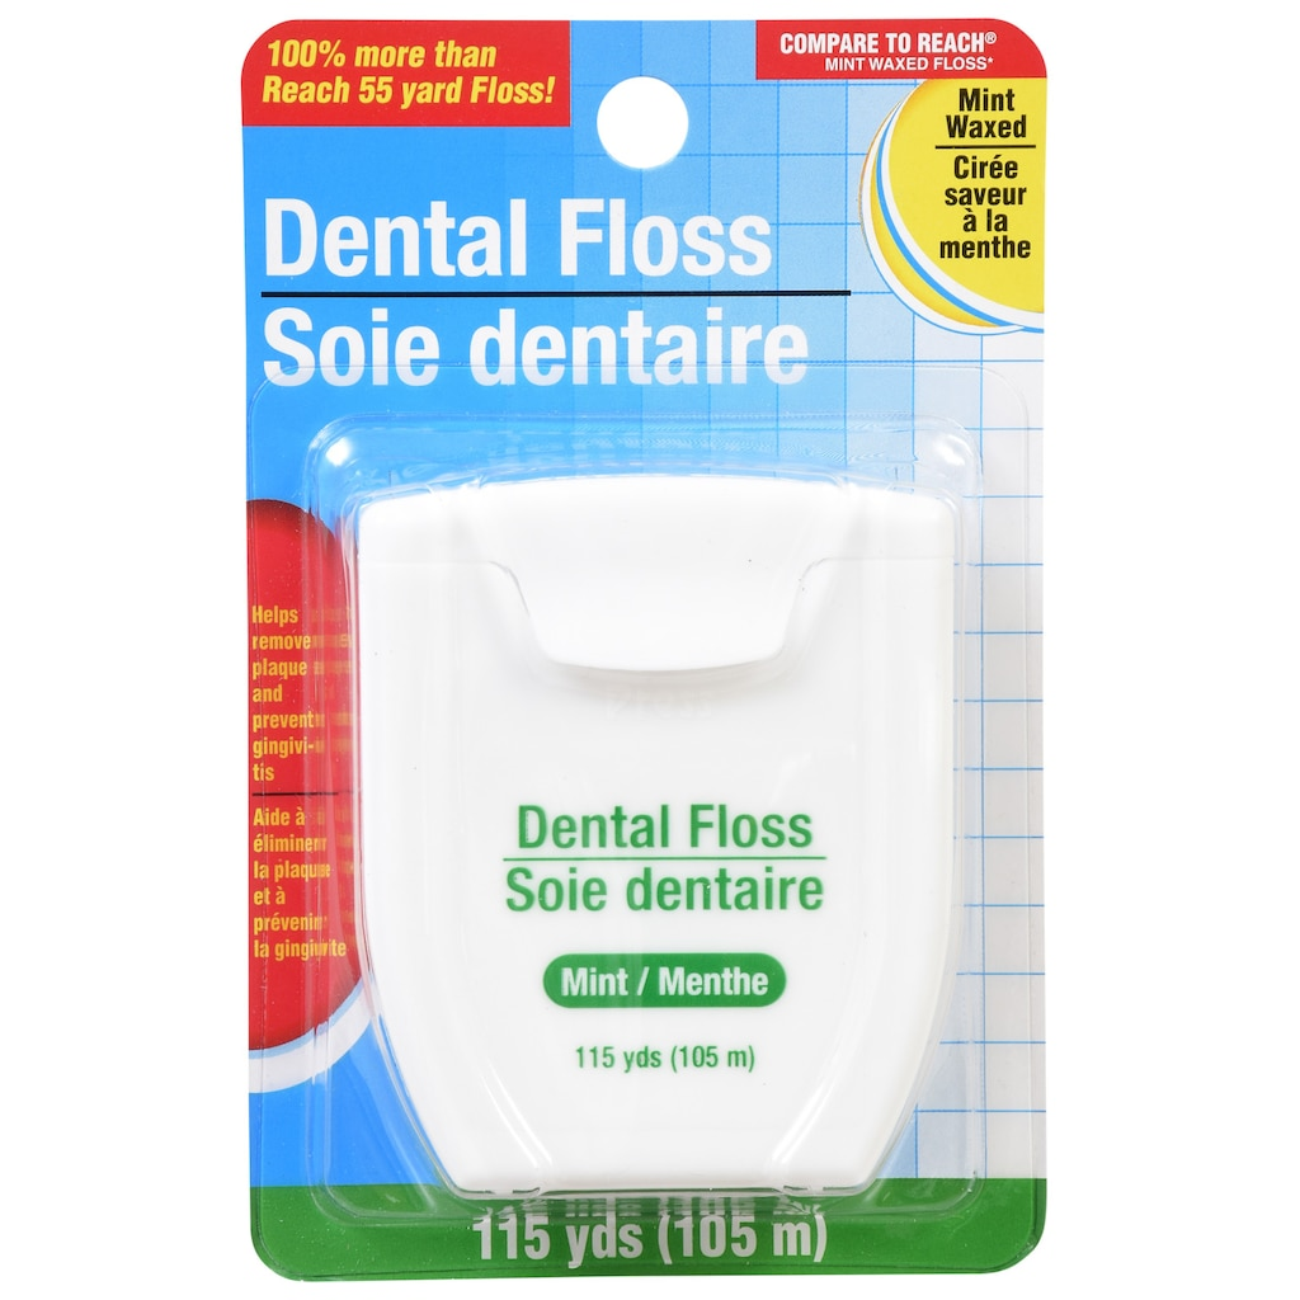 Dental Care Dollar Tree Inc